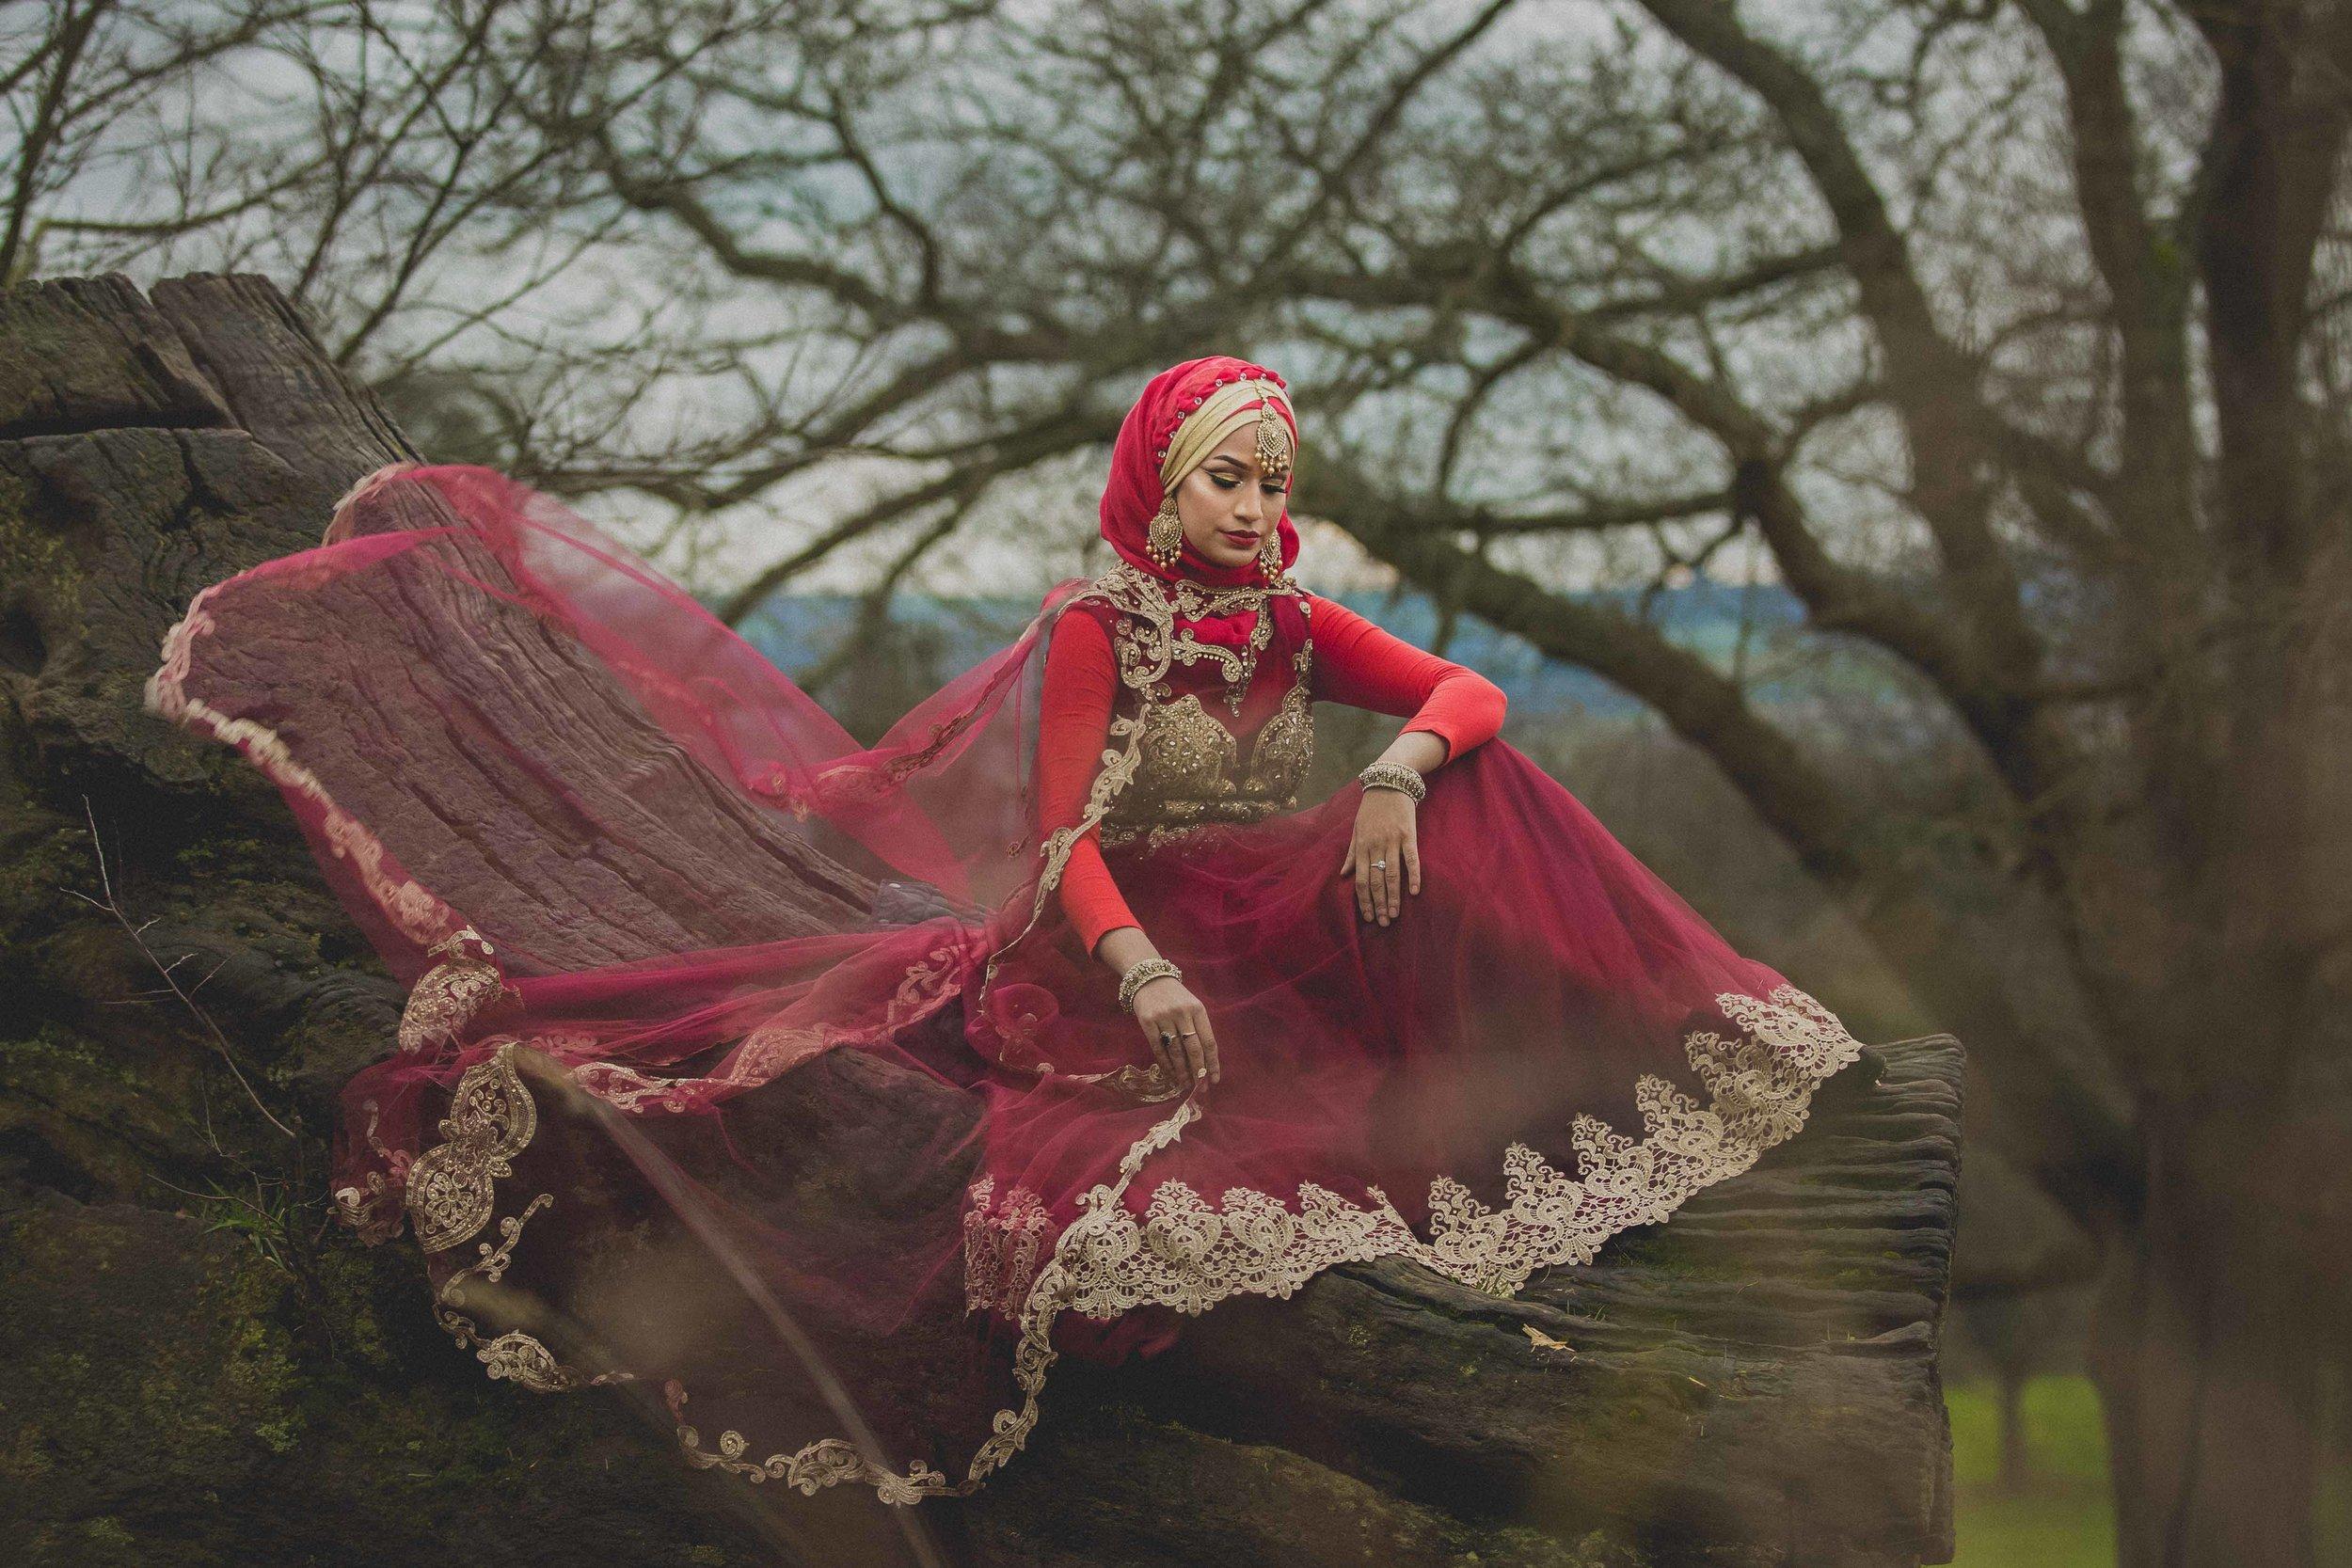 ashton-court-bristol-asian-bride-wedding-modest-street-aisha-rahman-fashion-photography-london-bristol-natalia-smith-photography-36.jpg